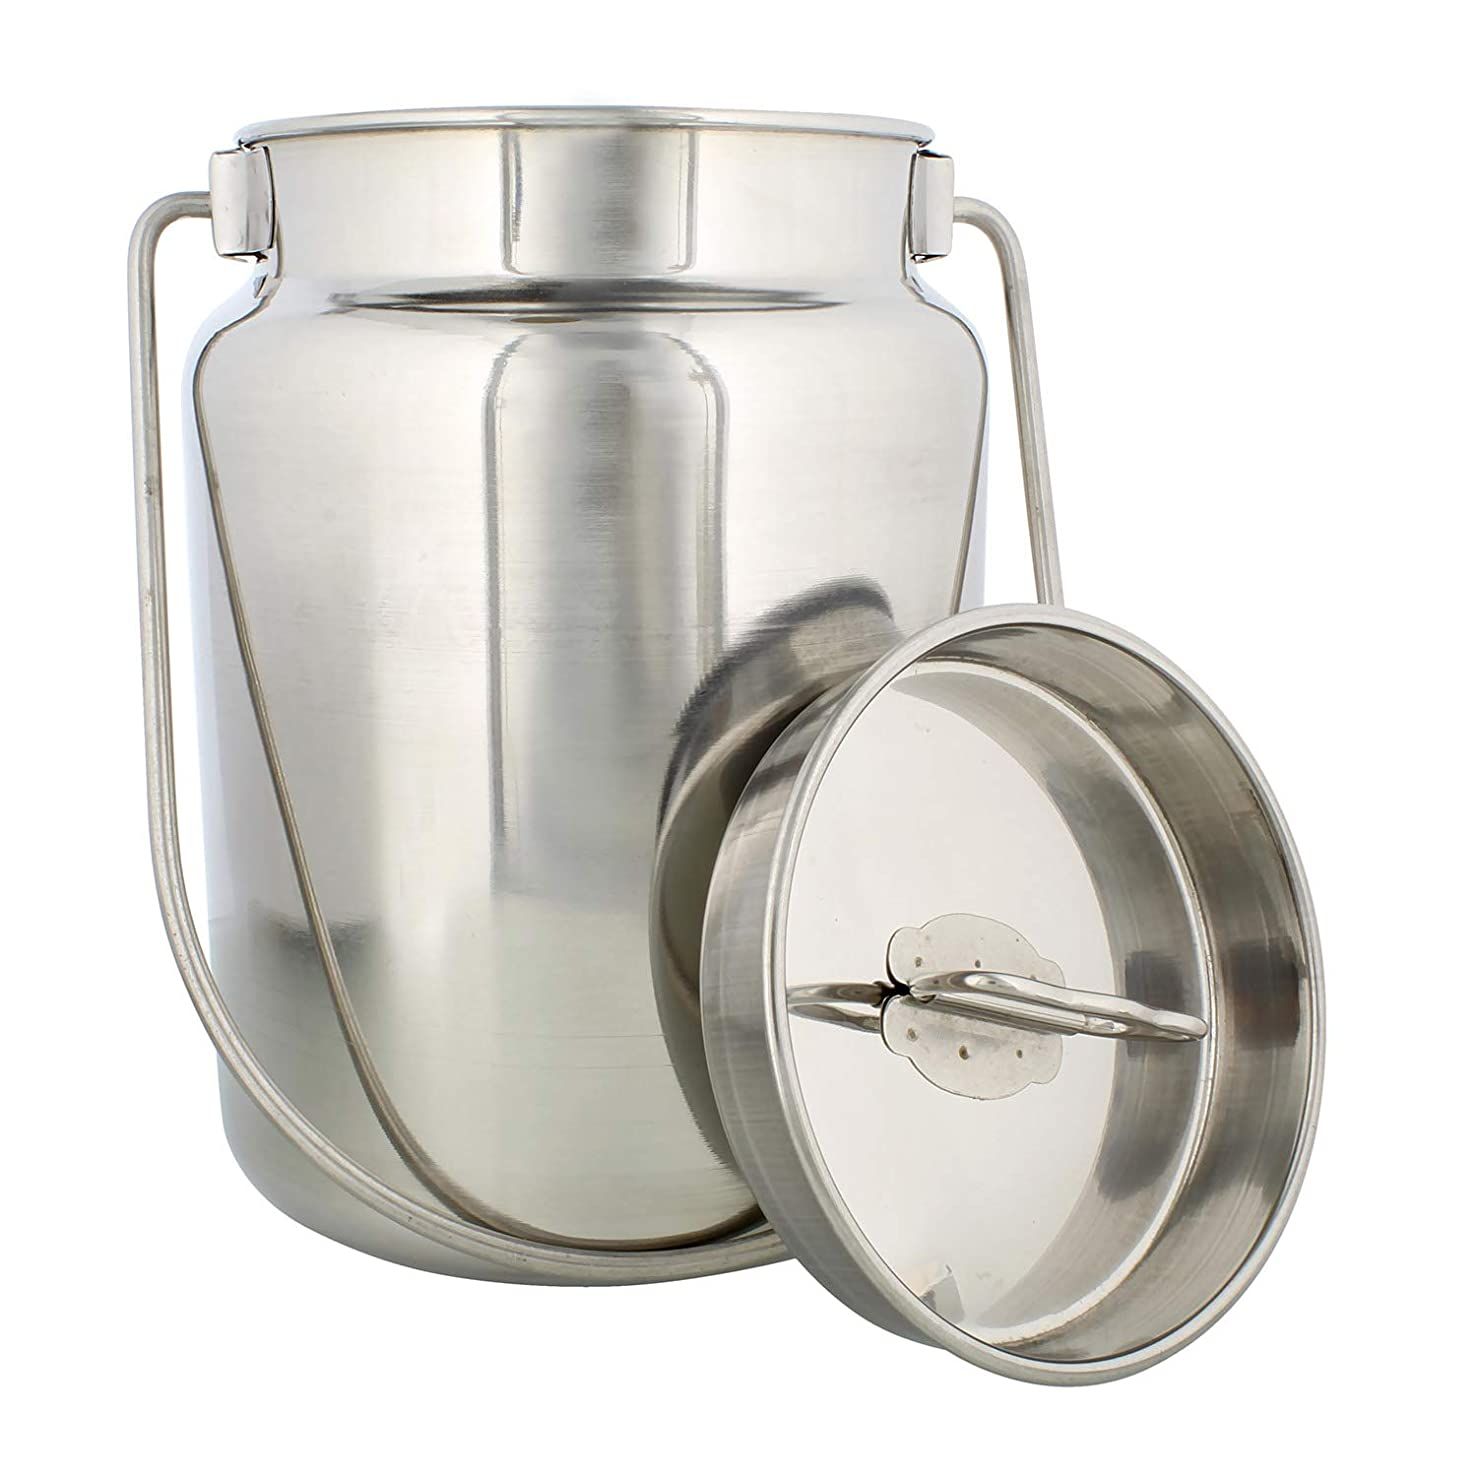 Rural365 Metal Milk Jug 1 Gallon (4L) Stainless Steel Jug & Lid – Metal Milk Can Juice Container, Milk Bottle with Lid